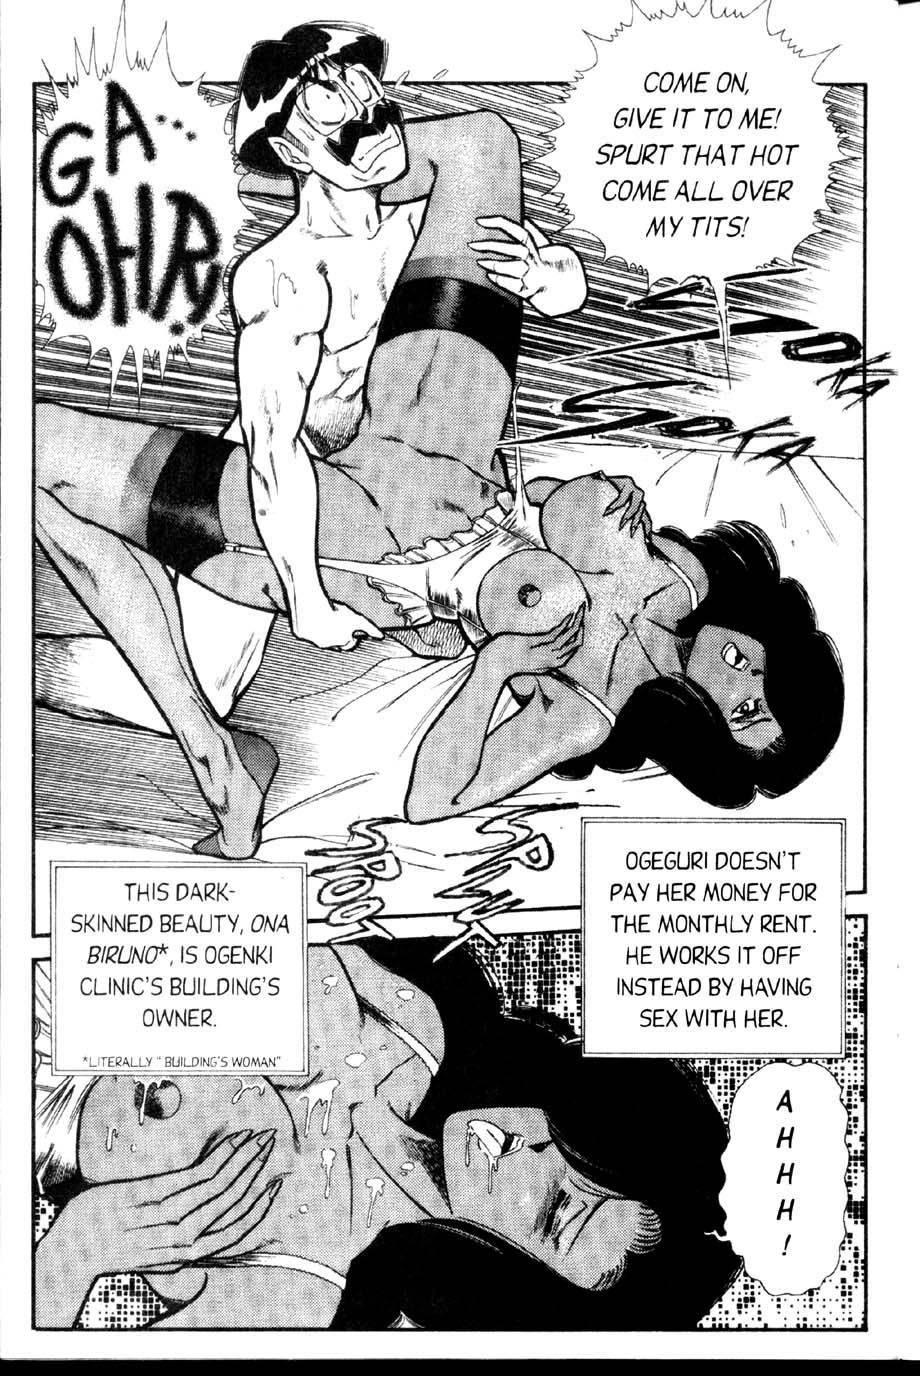 Ogenki Clinic Vol.2 94